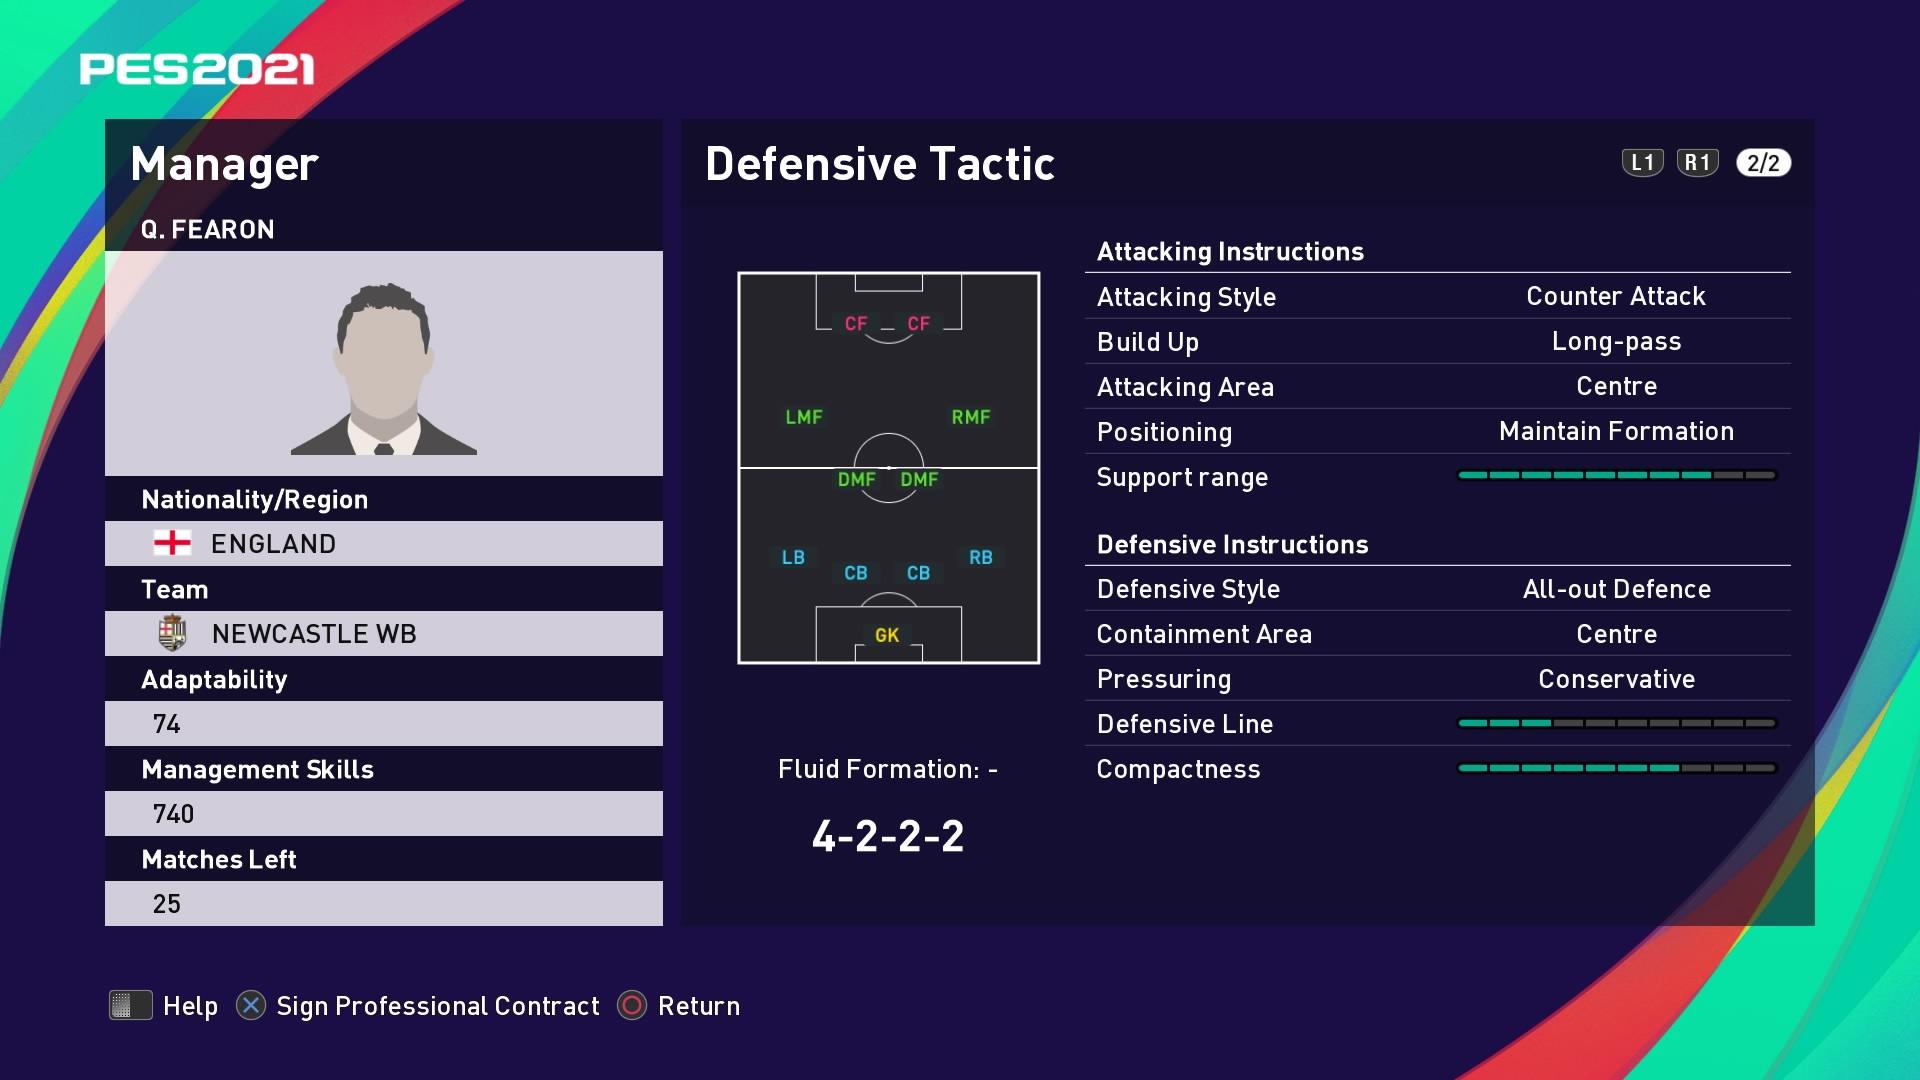 Q. Fearon (Steve Bruce) Defensive Tactic in PES 2021 myClub